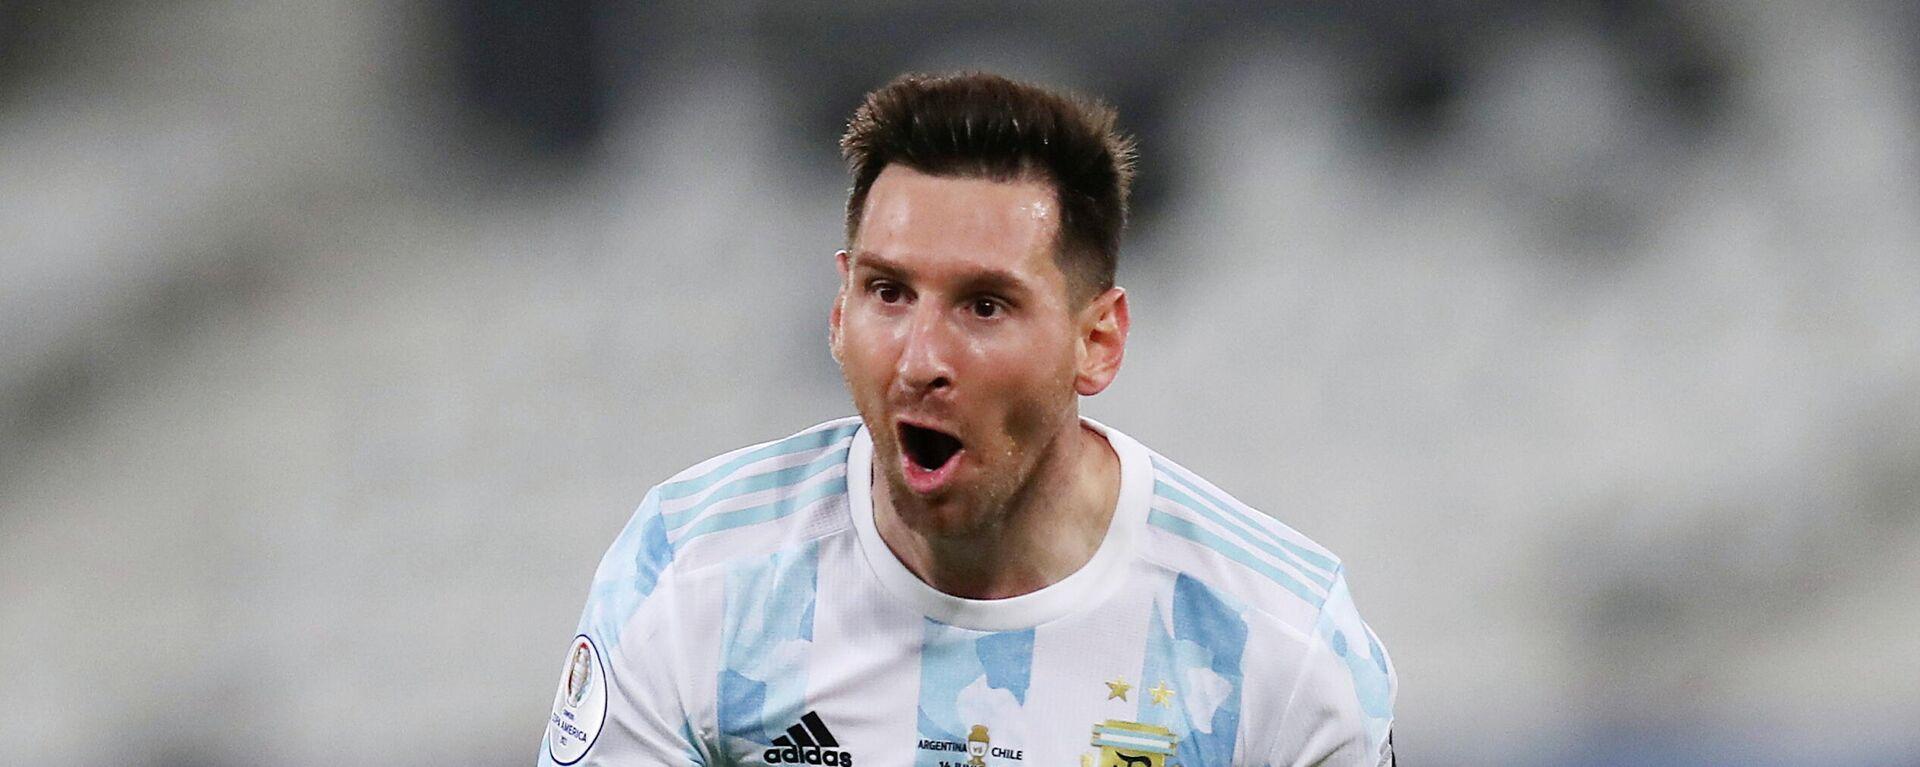 El delantero argentino Lionel Messi durante la Copa América 2021 - Sputnik Mundo, 1920, 18.06.2021